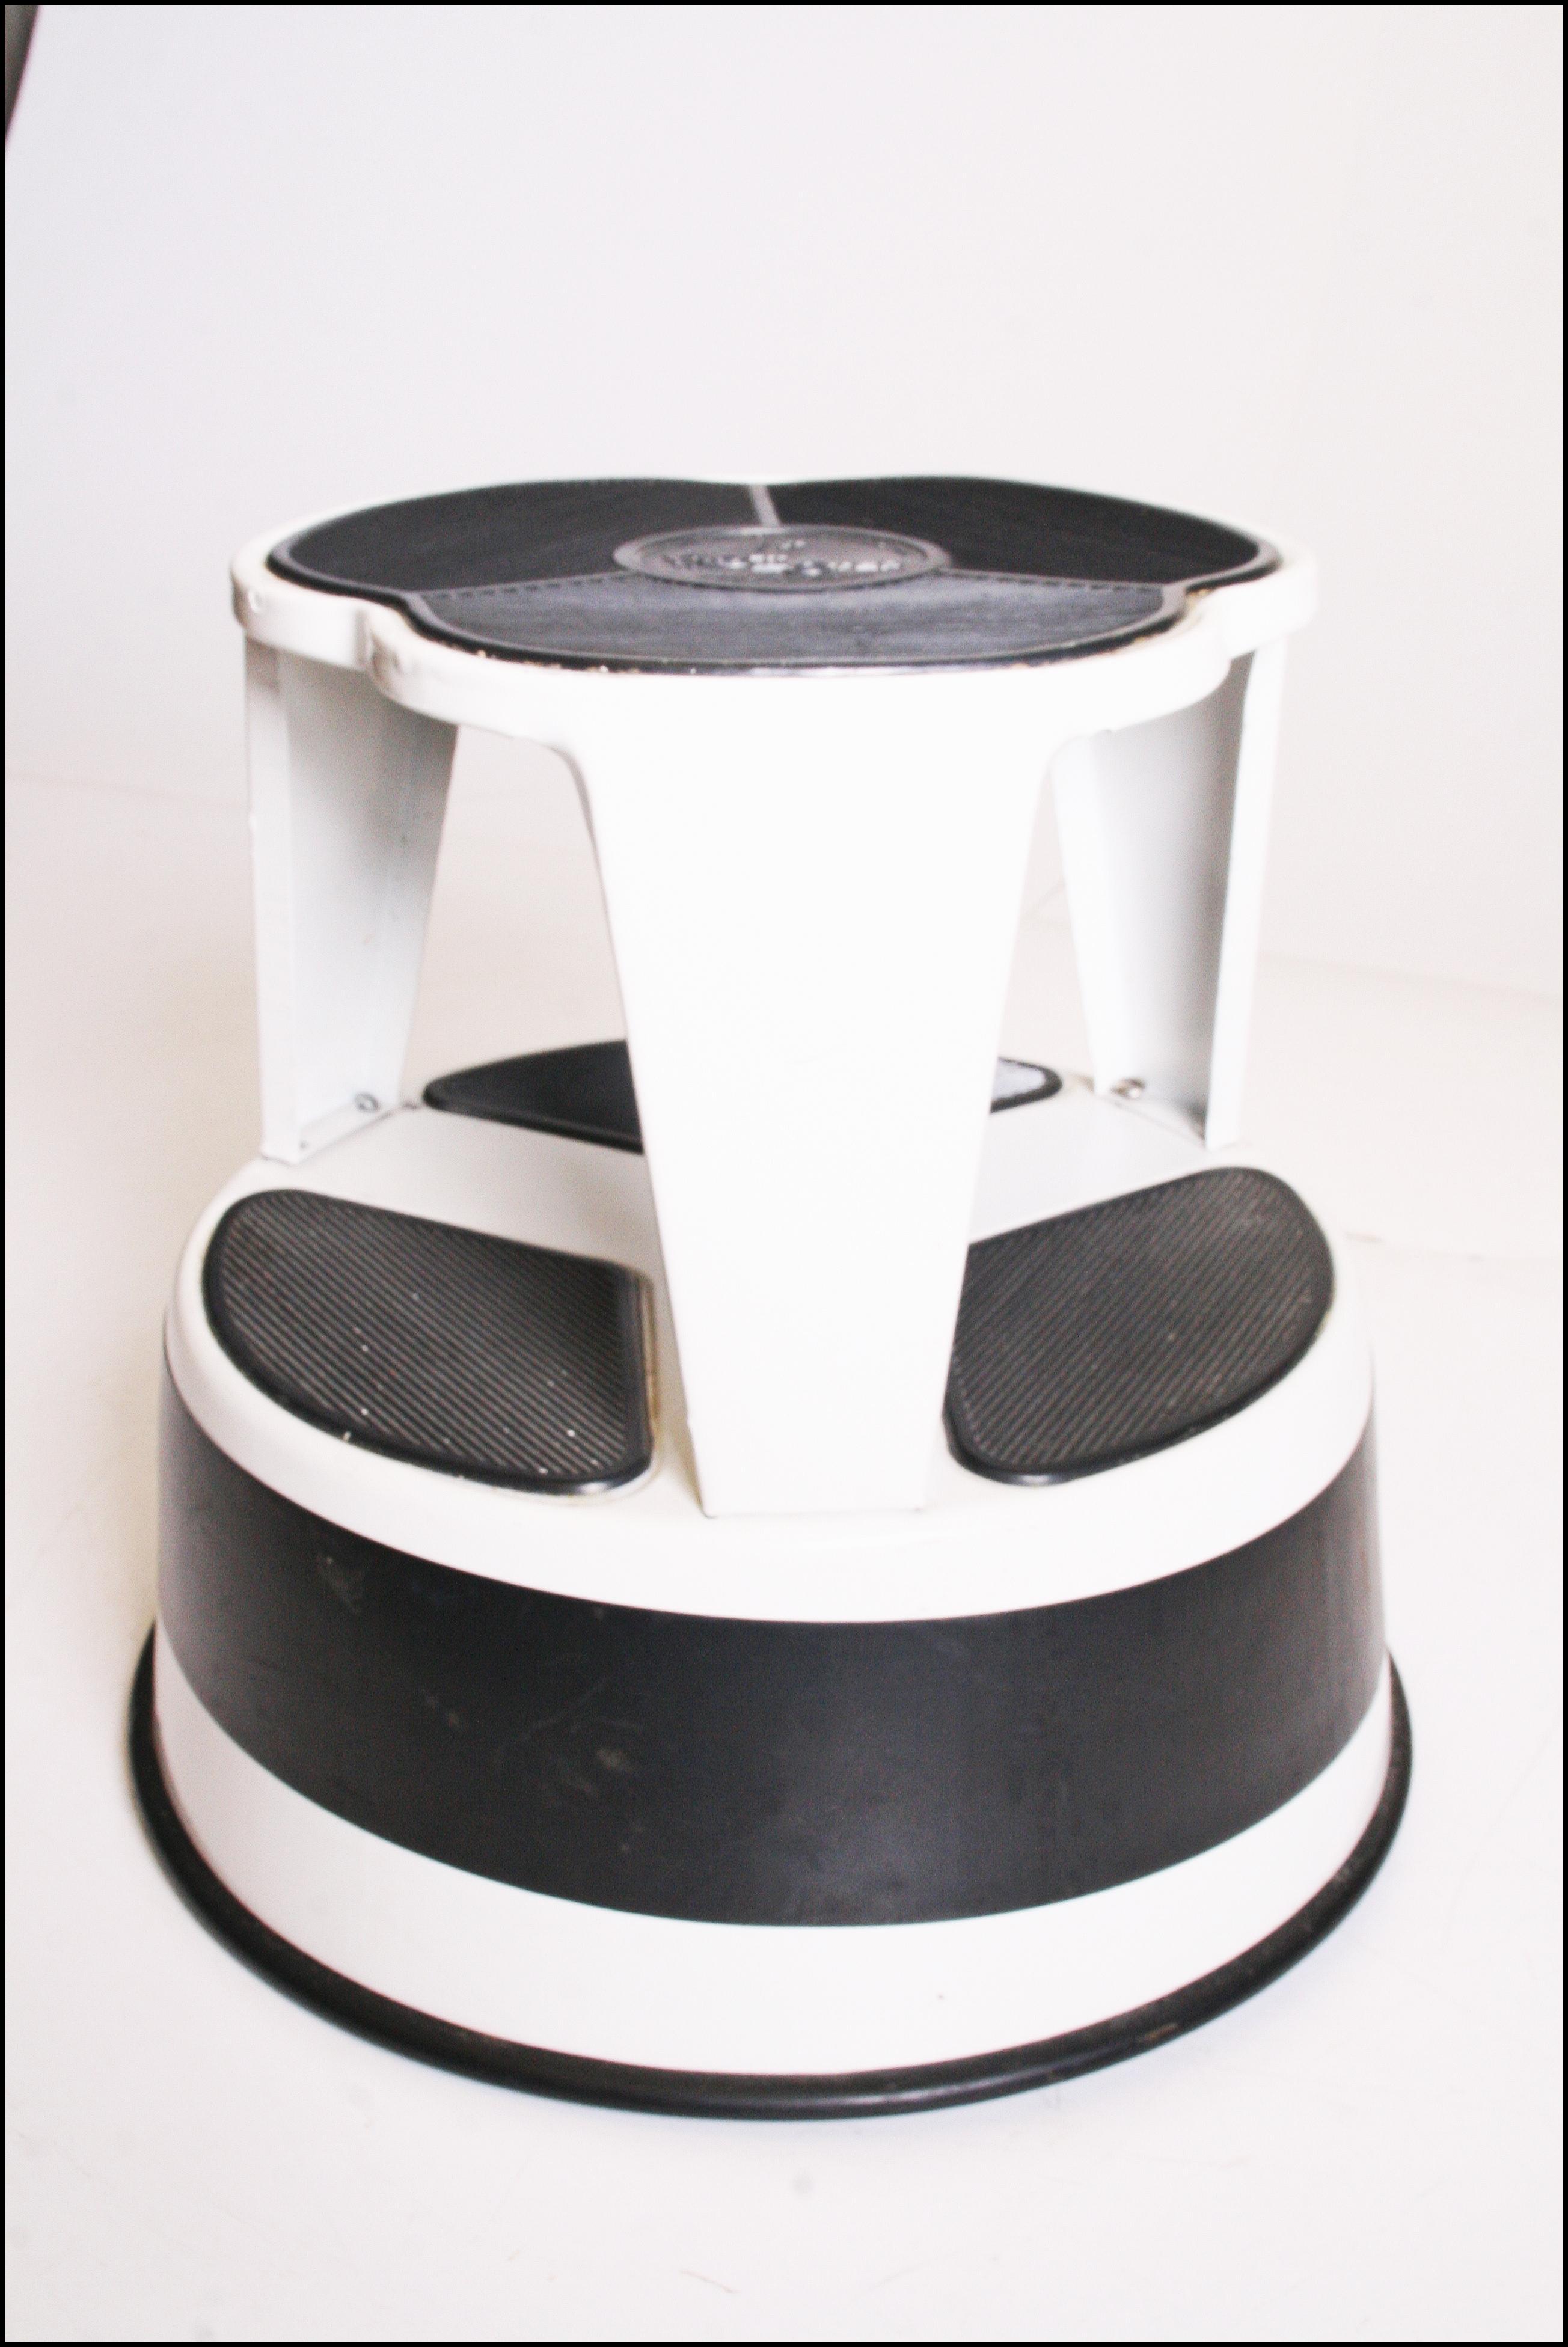 Mid Century Modern White Cramer Kik Step Rolling Foot Stool - Image 3 of 11  sc 1 st  Chairish & Mid Century Modern White Cramer Kik Step Rolling Foot Stool | Chairish islam-shia.org